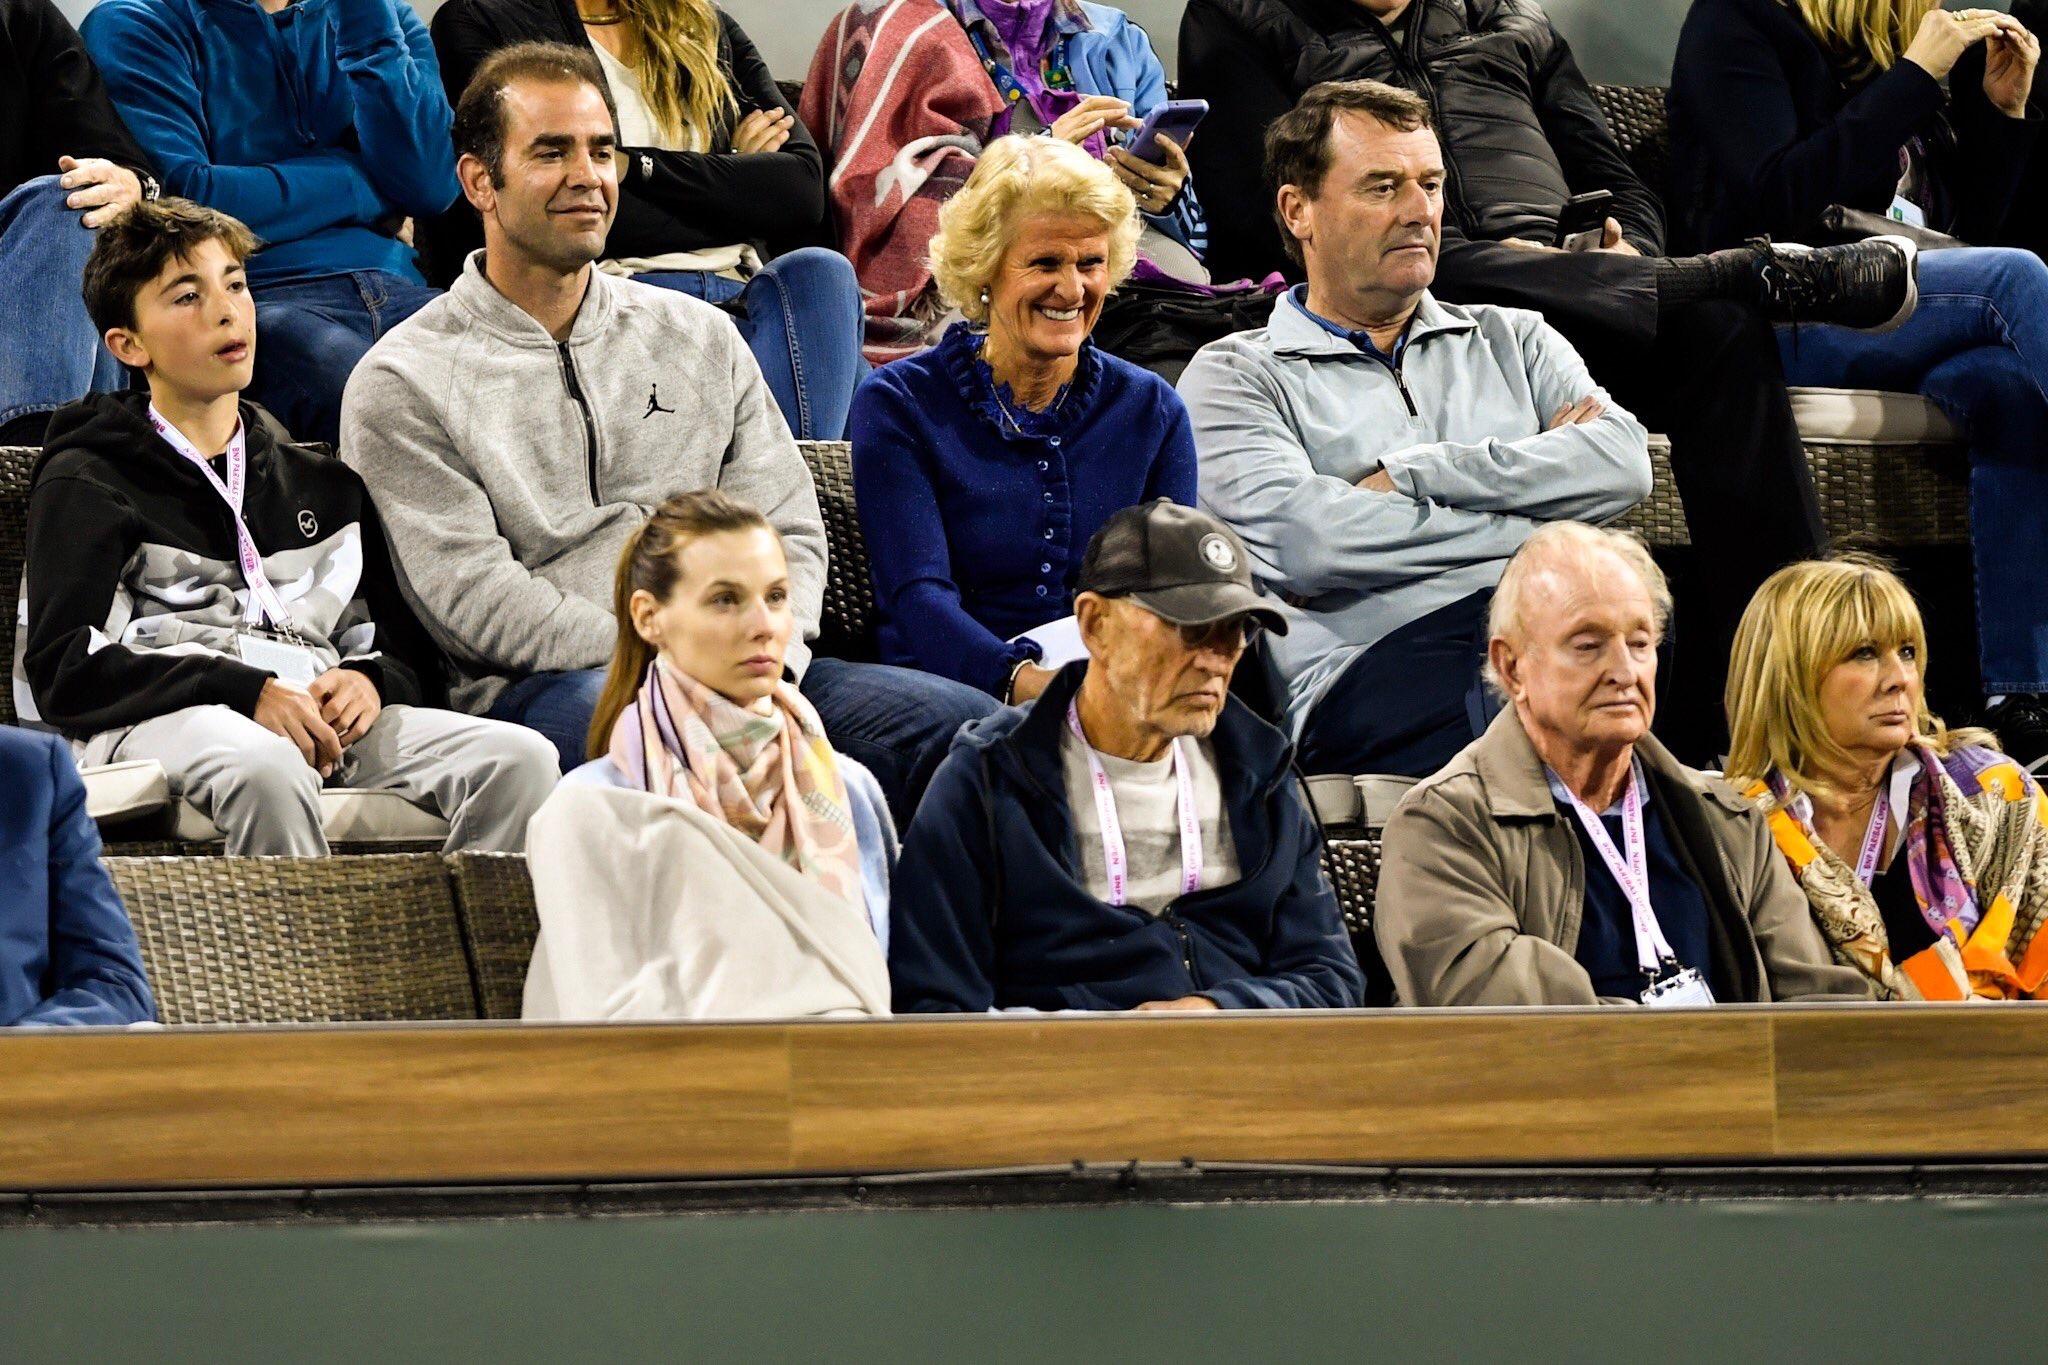 Pete Sampras and Rod Laver attend 2018 BNP Paribas Open Federer-Chung Quarterfinal in Indian Wells - Federer Defeats Chung to Reach BNP Paribas Open Semifinals